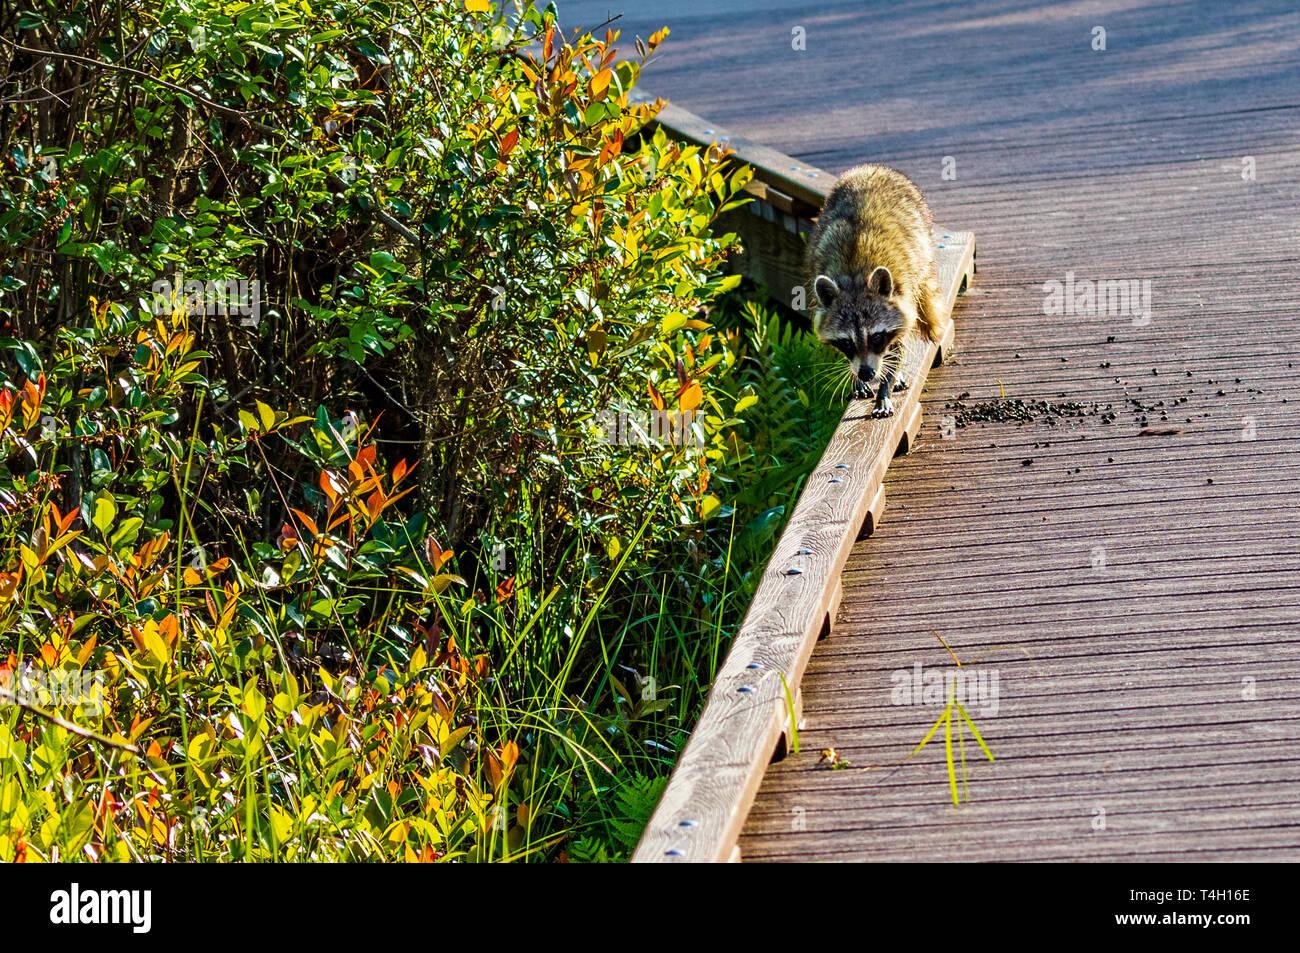 An American Raccoon walks along a board above a swamp. Stock Photo